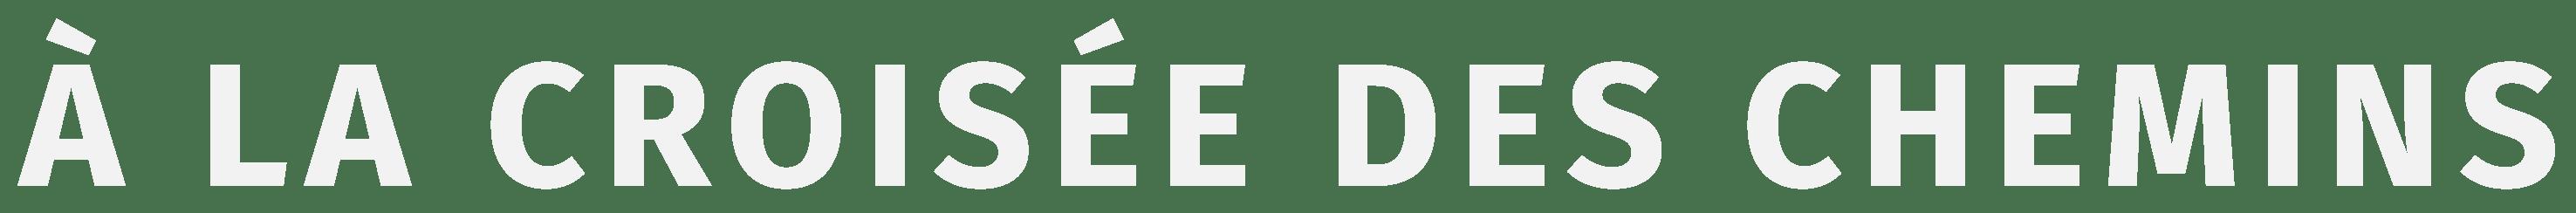 titre-alcdc